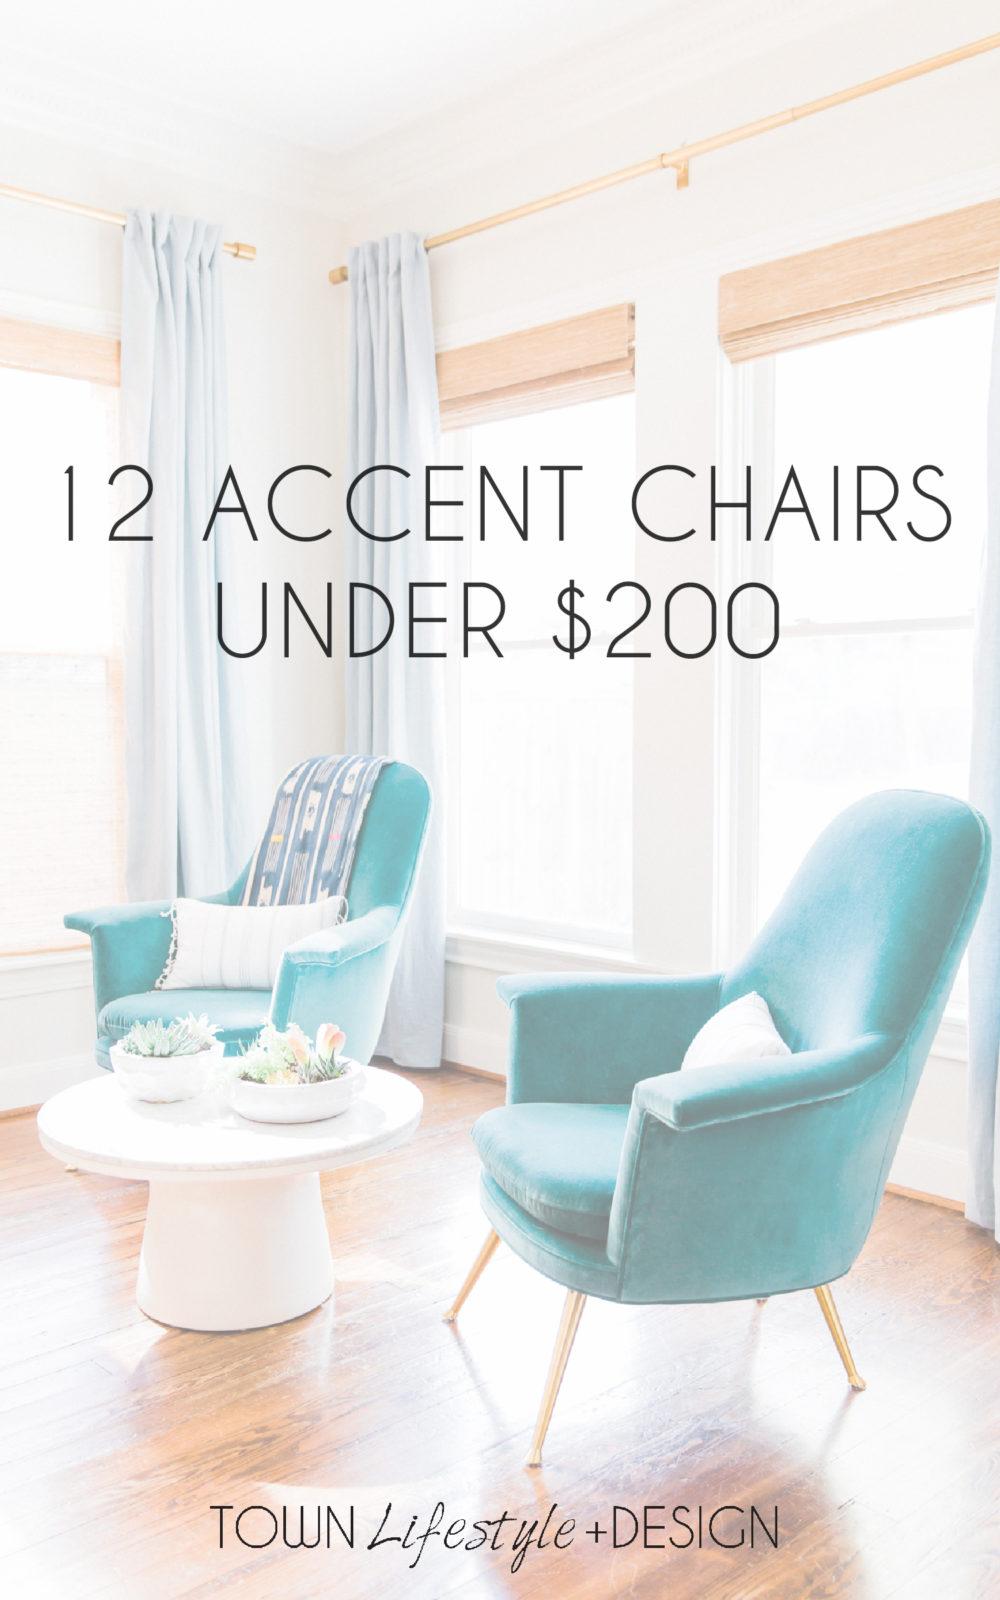 Tremendous 12 Accent Chairs Under 200 Town Lifestyle Design Customarchery Wood Chair Design Ideas Customarcherynet